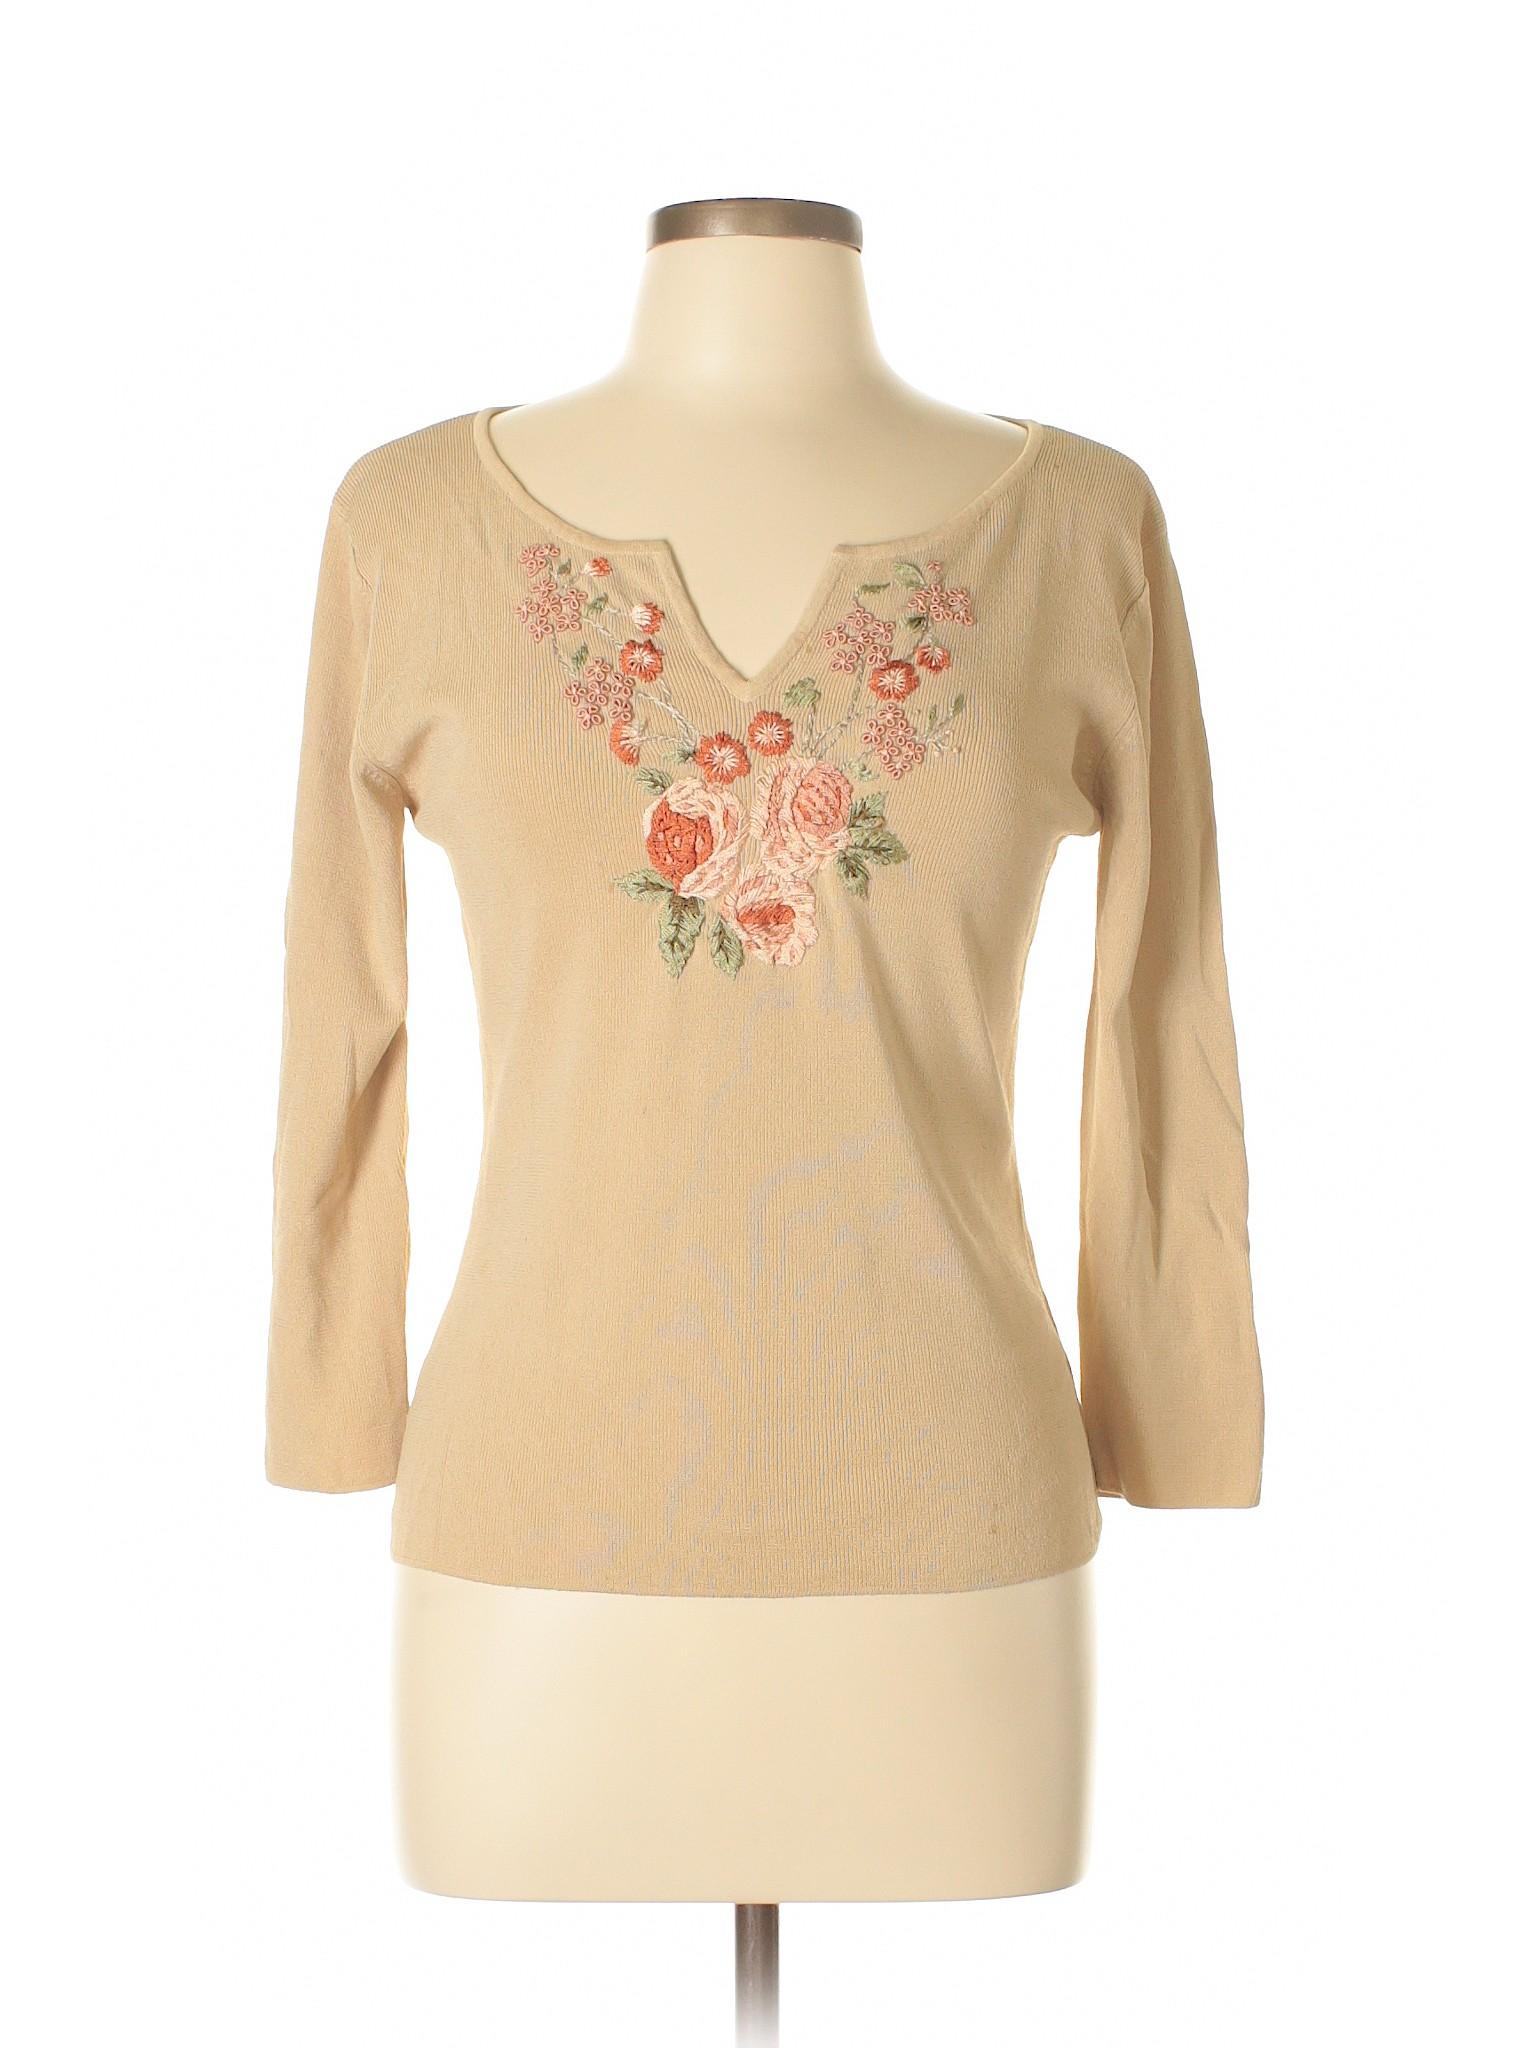 winter Boutique Sweater Nicole Michelle Pullover 6BdwBX